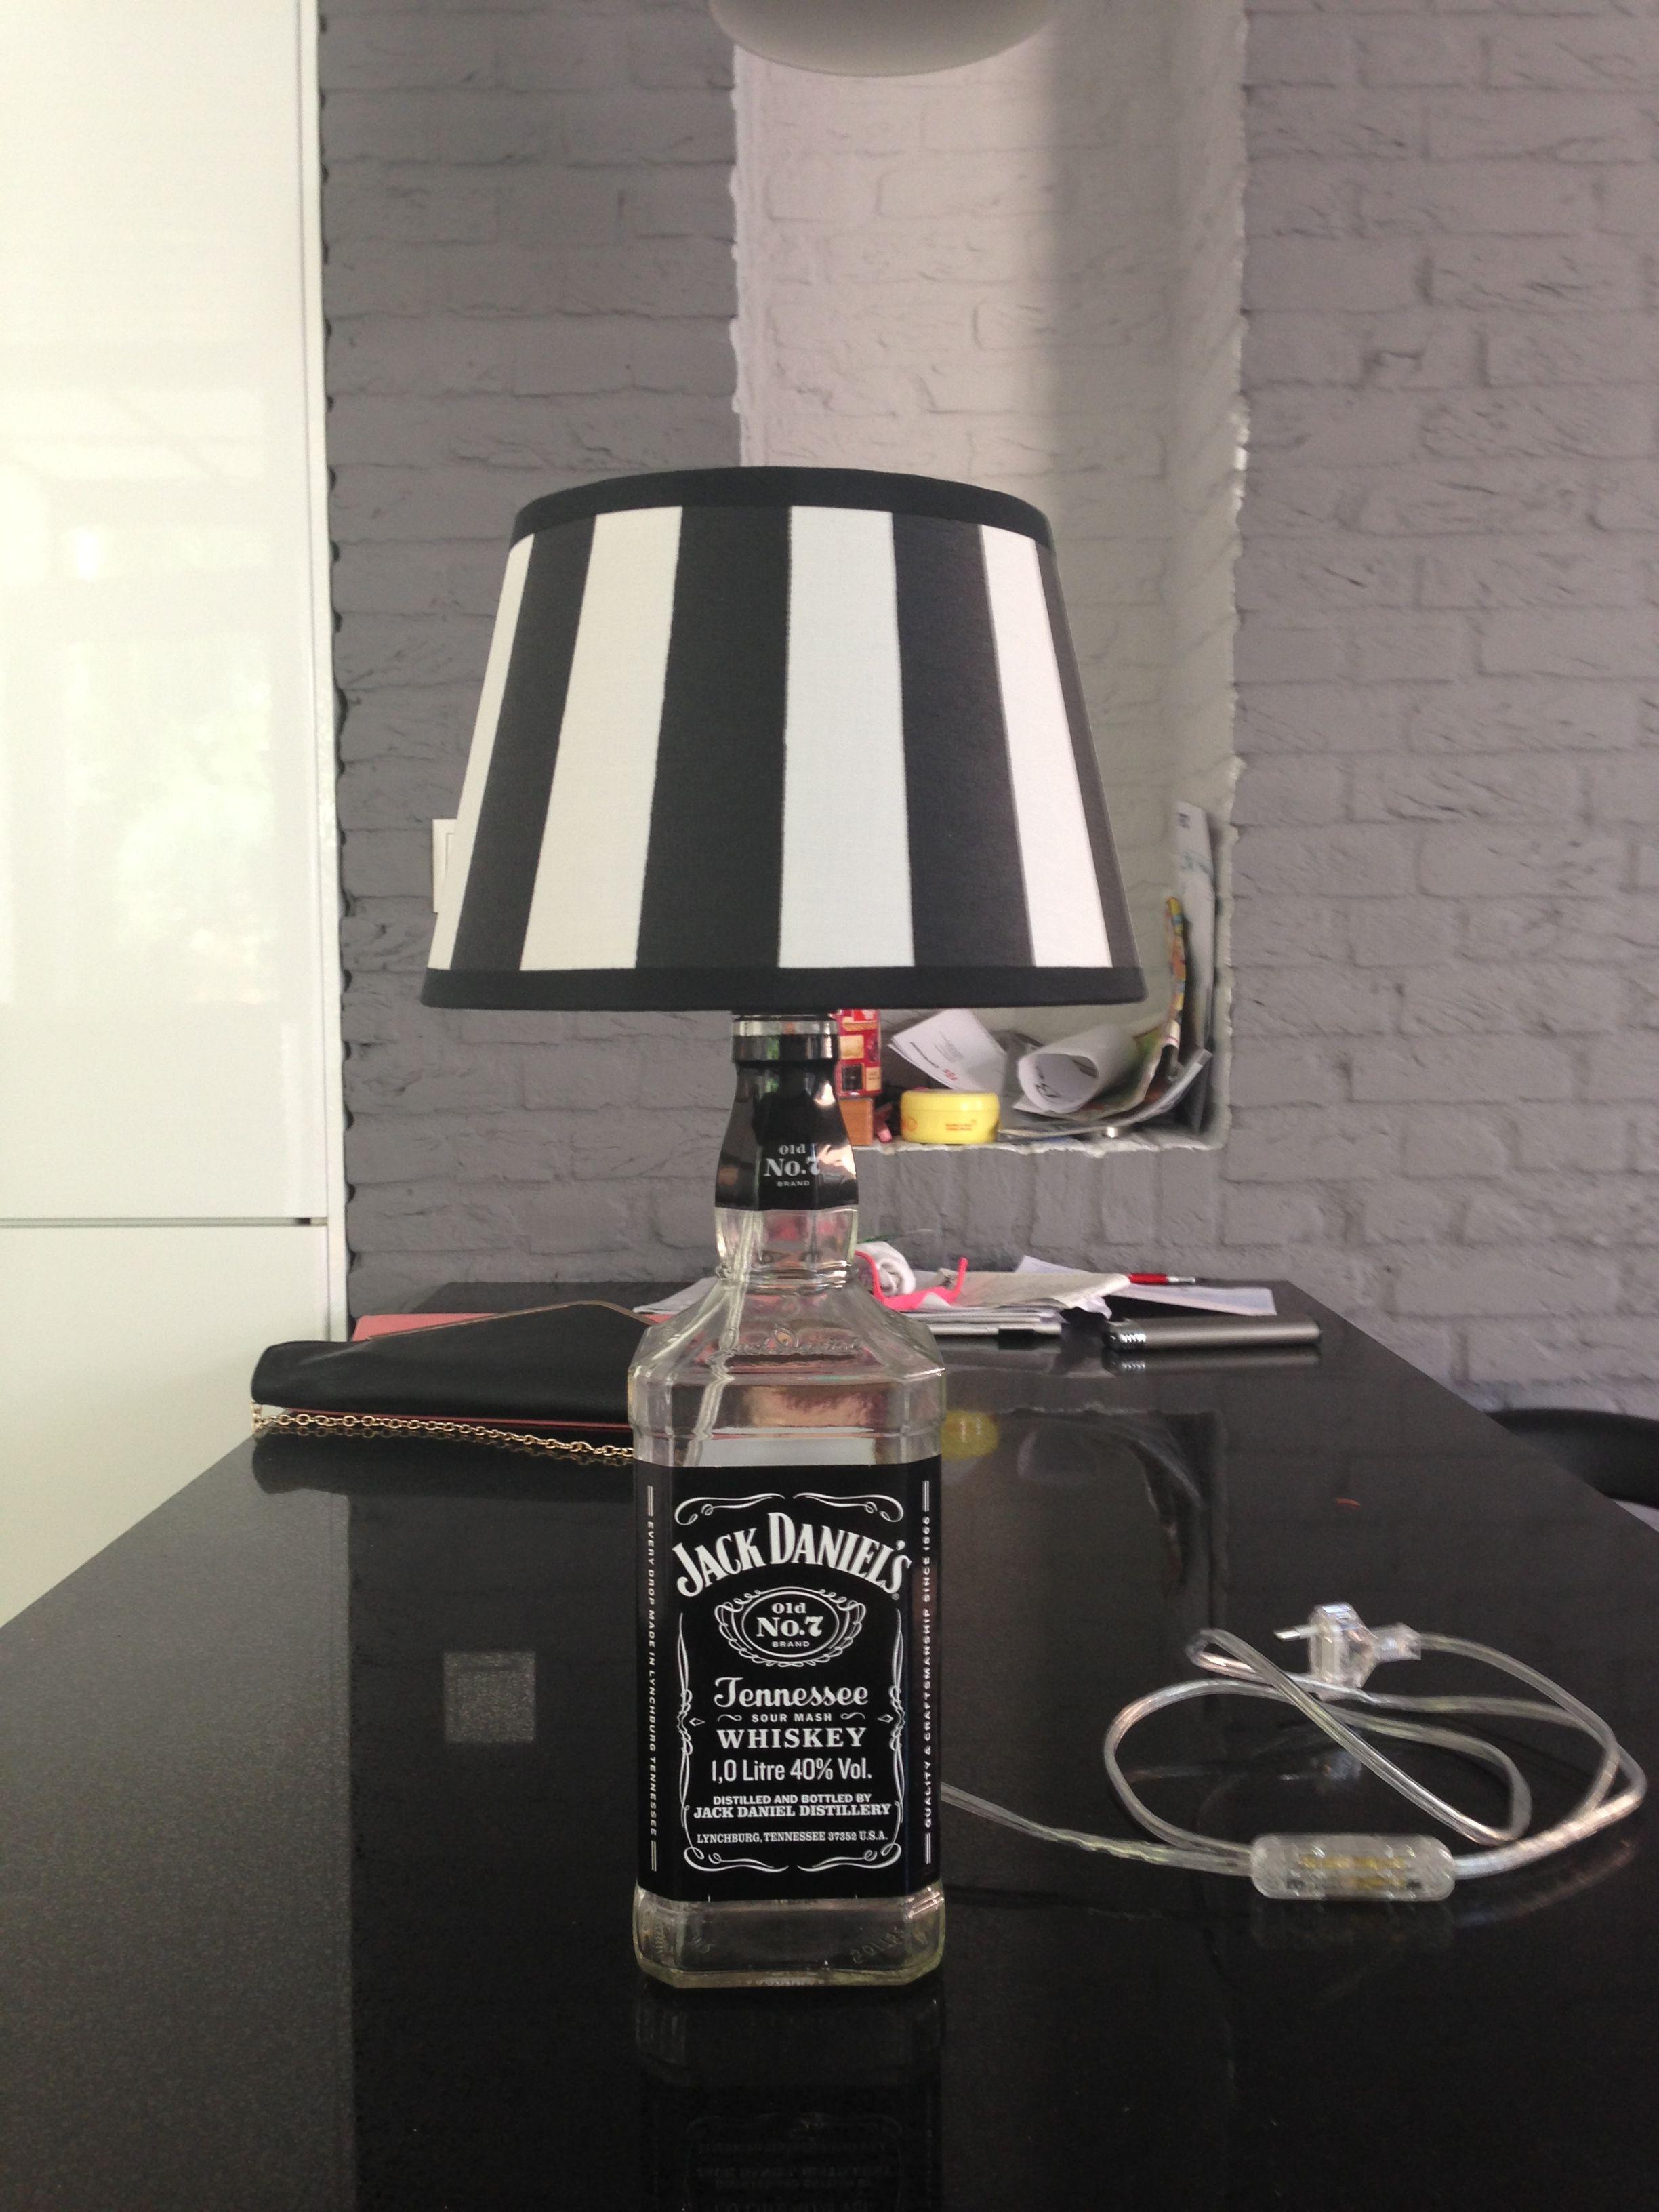 Diy jack daniels lamp crafts pinterest jack daniels lamp diy jack daniels lamp aloadofball Gallery